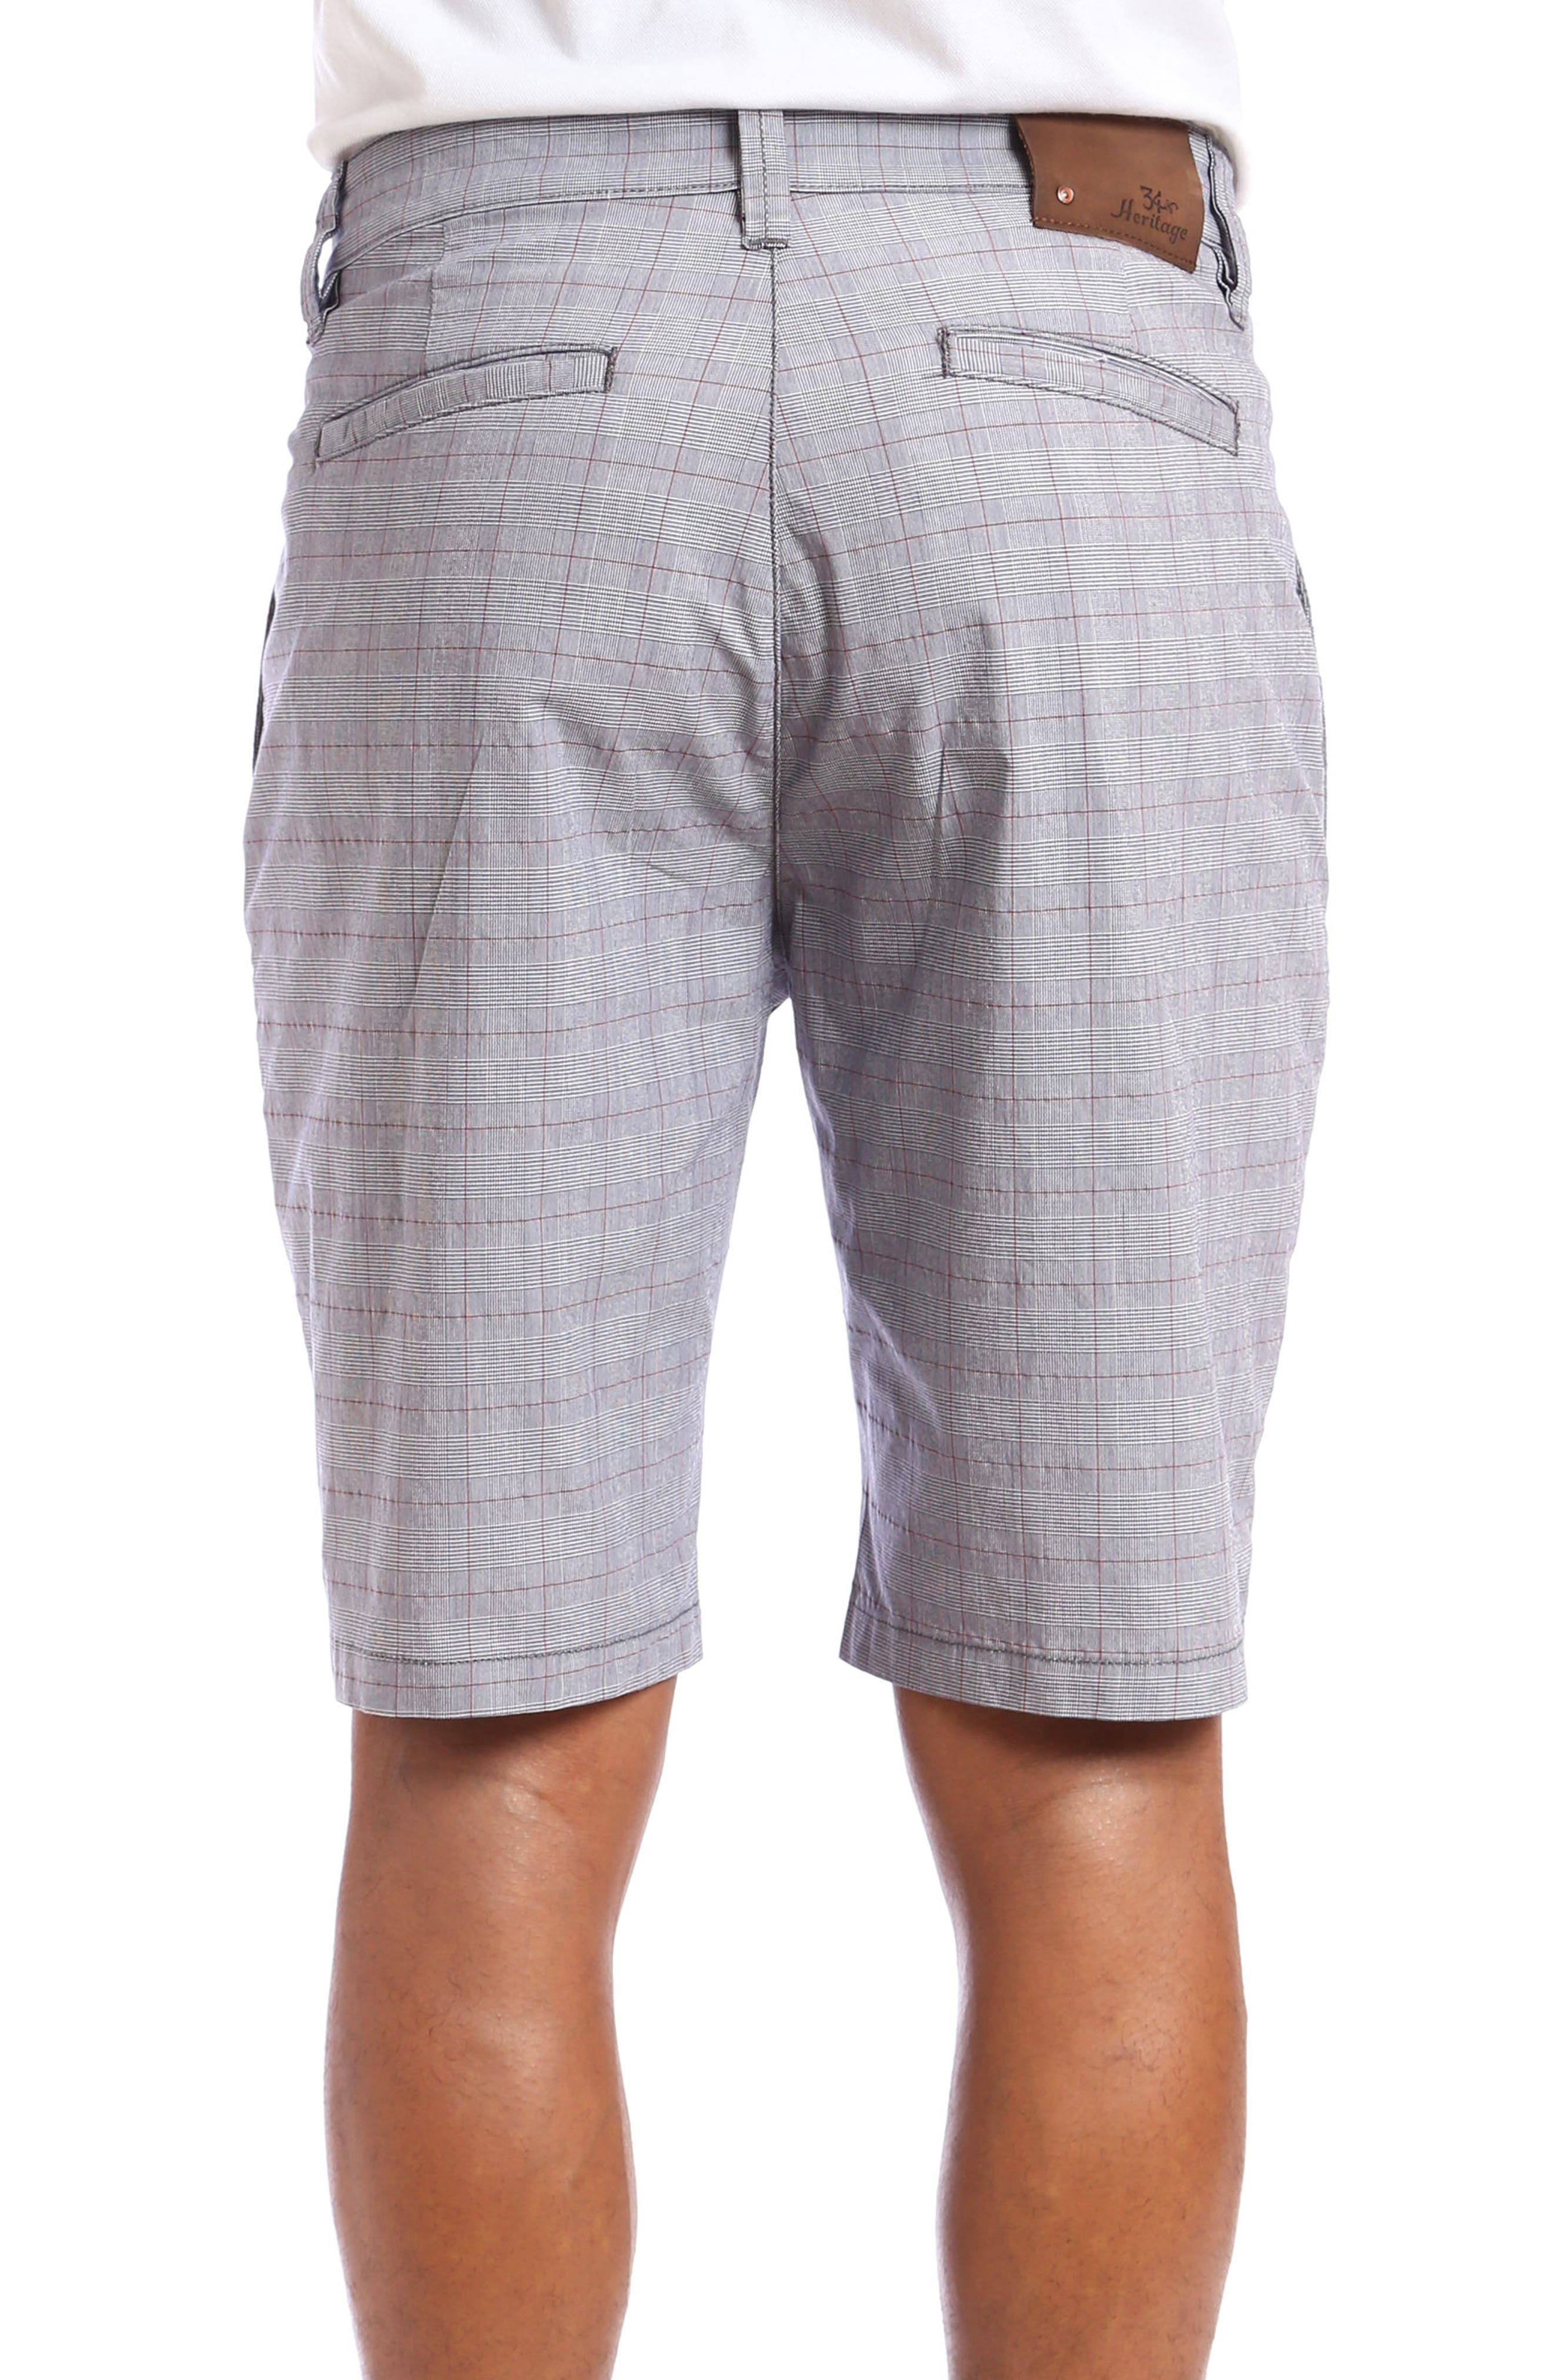 34 HERITAGE,                             Nevada Twill Shorts,                             Alternate thumbnail 2, color,                             020